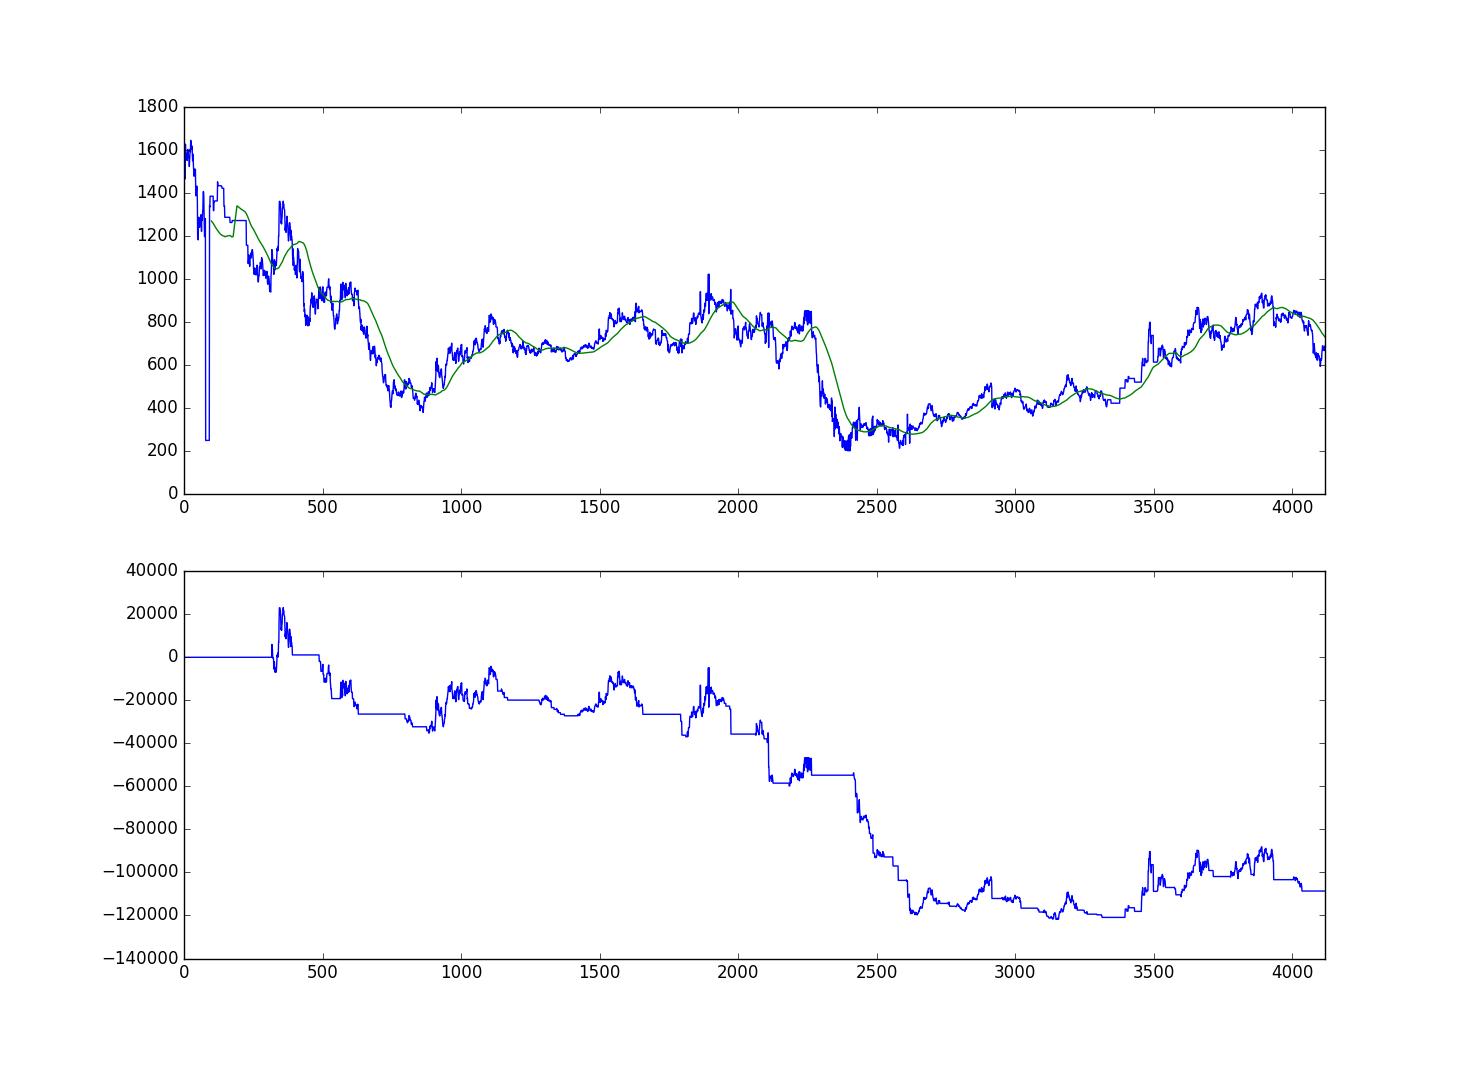 stock_price_1